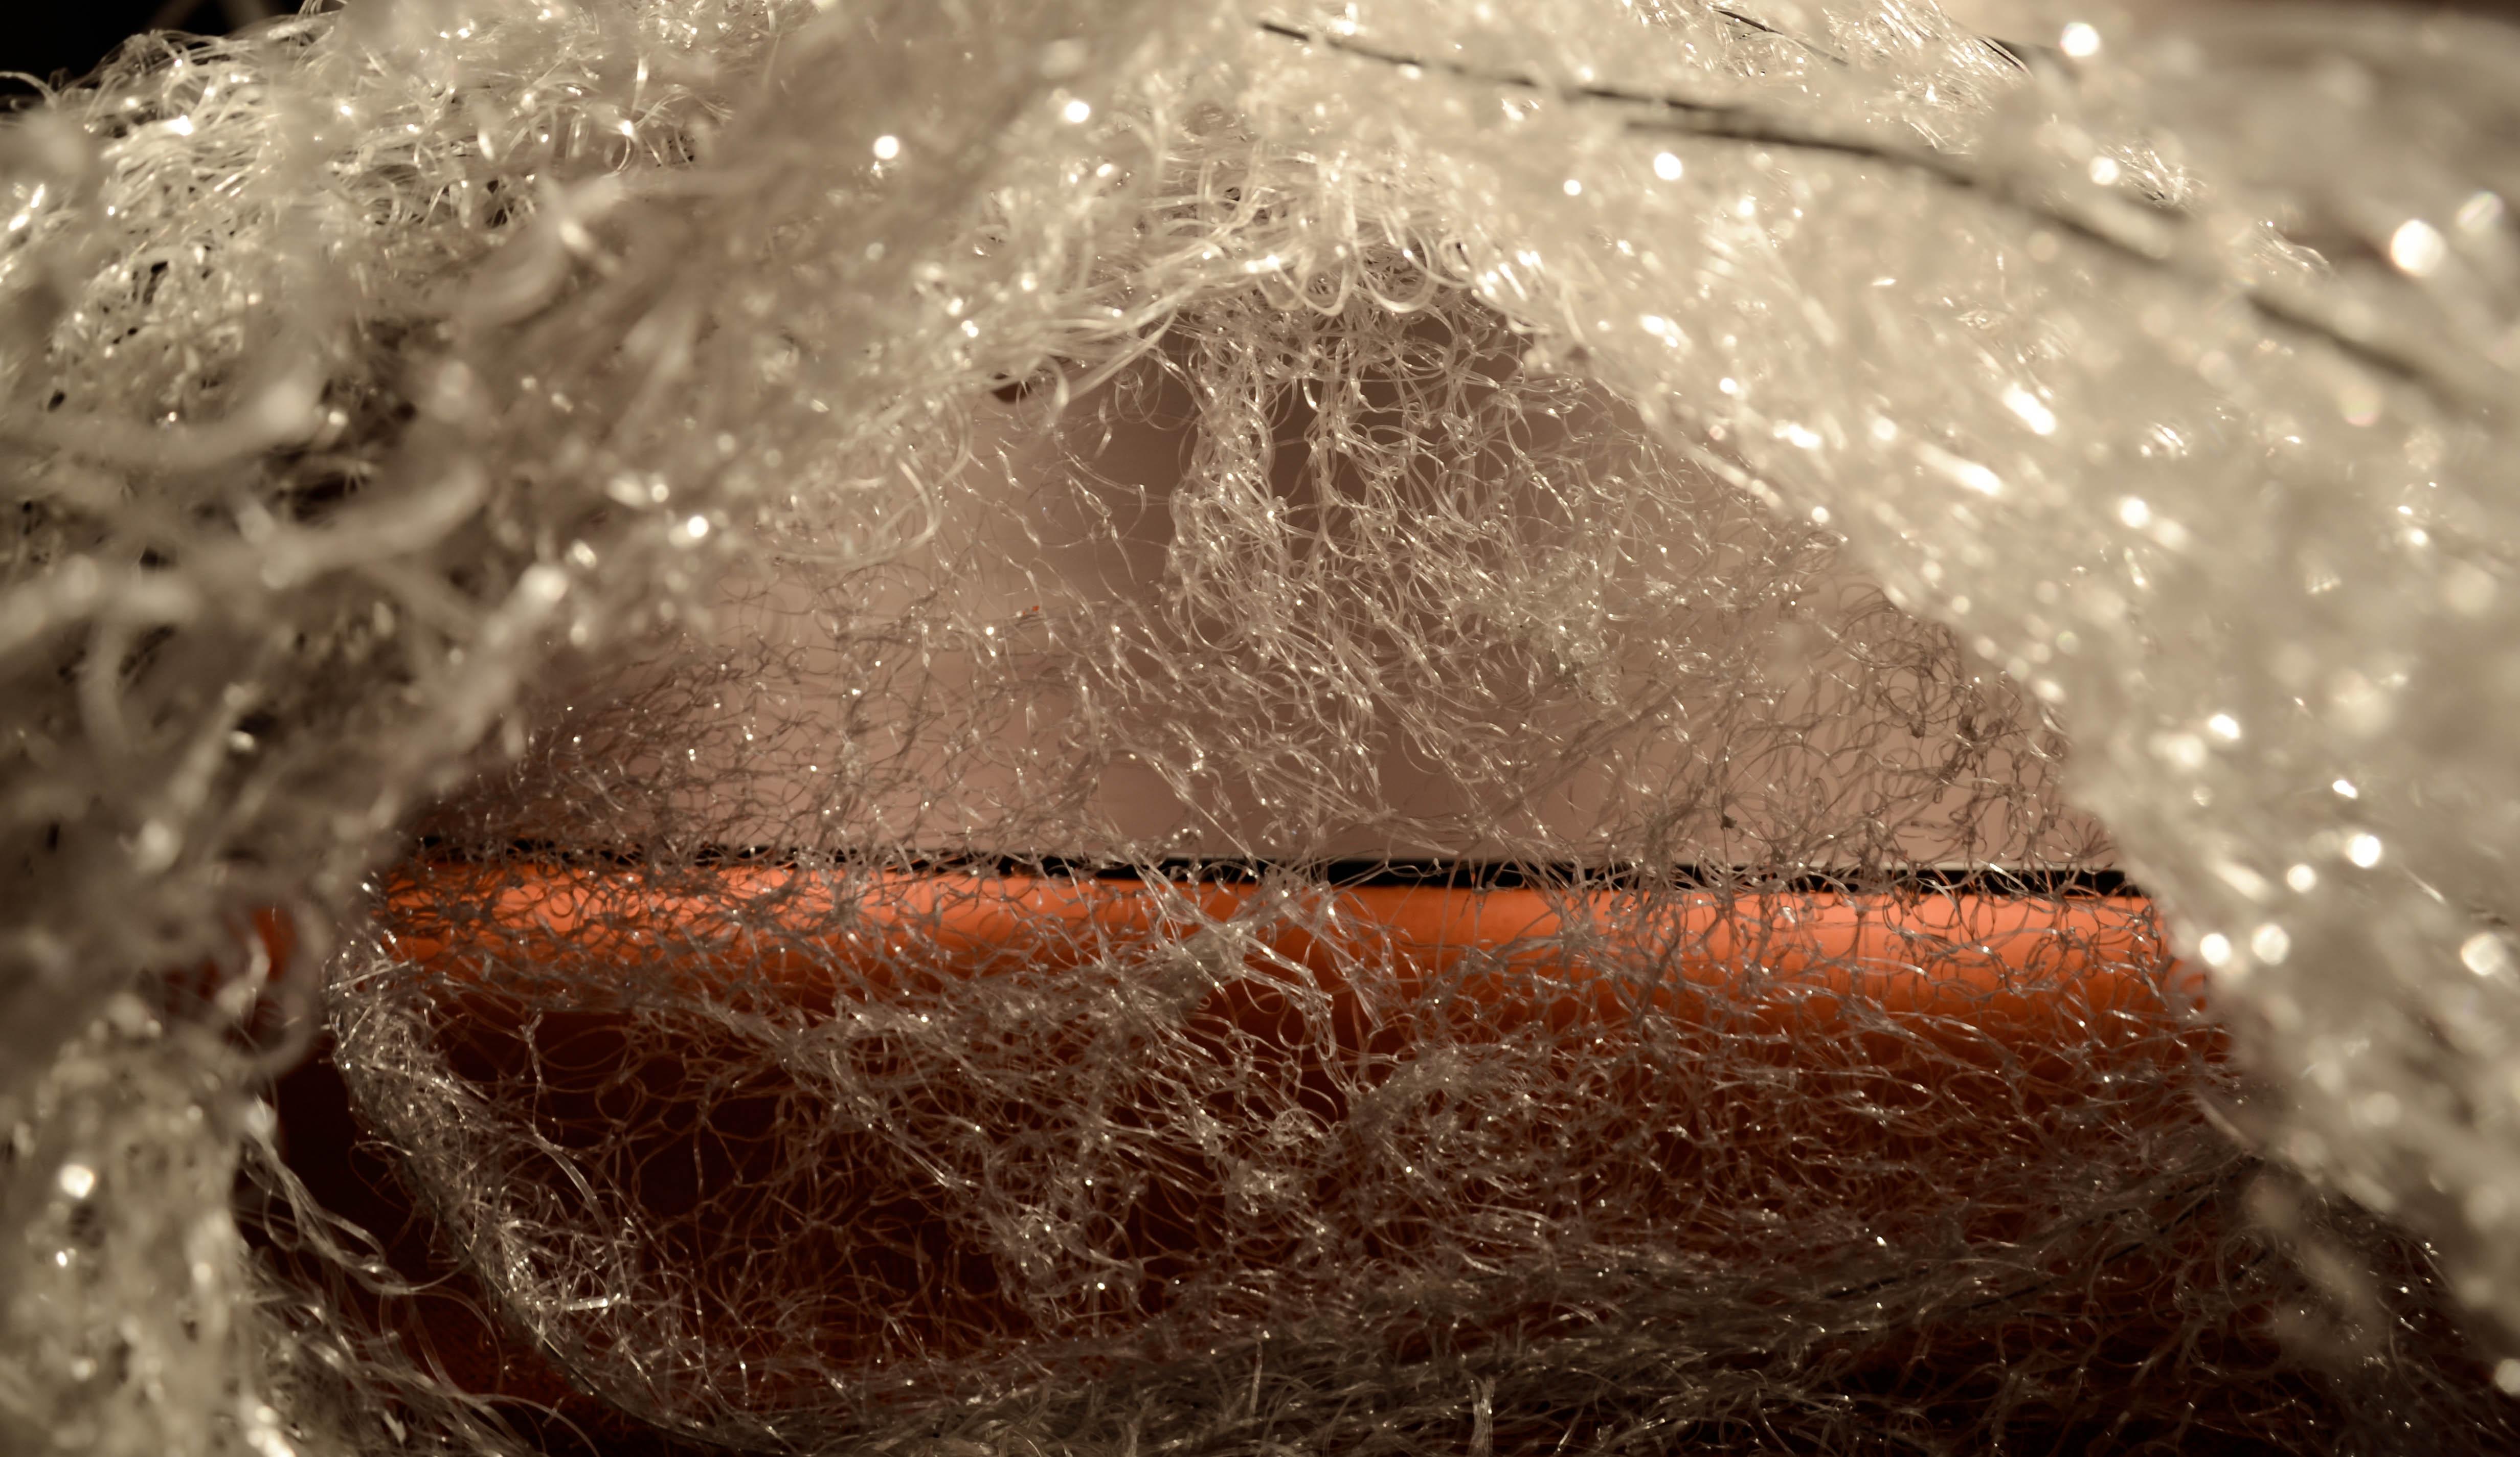 la-invencin-del-silencio-detalle---osde---chaco---argentina---------------oct2013---------fotografa-